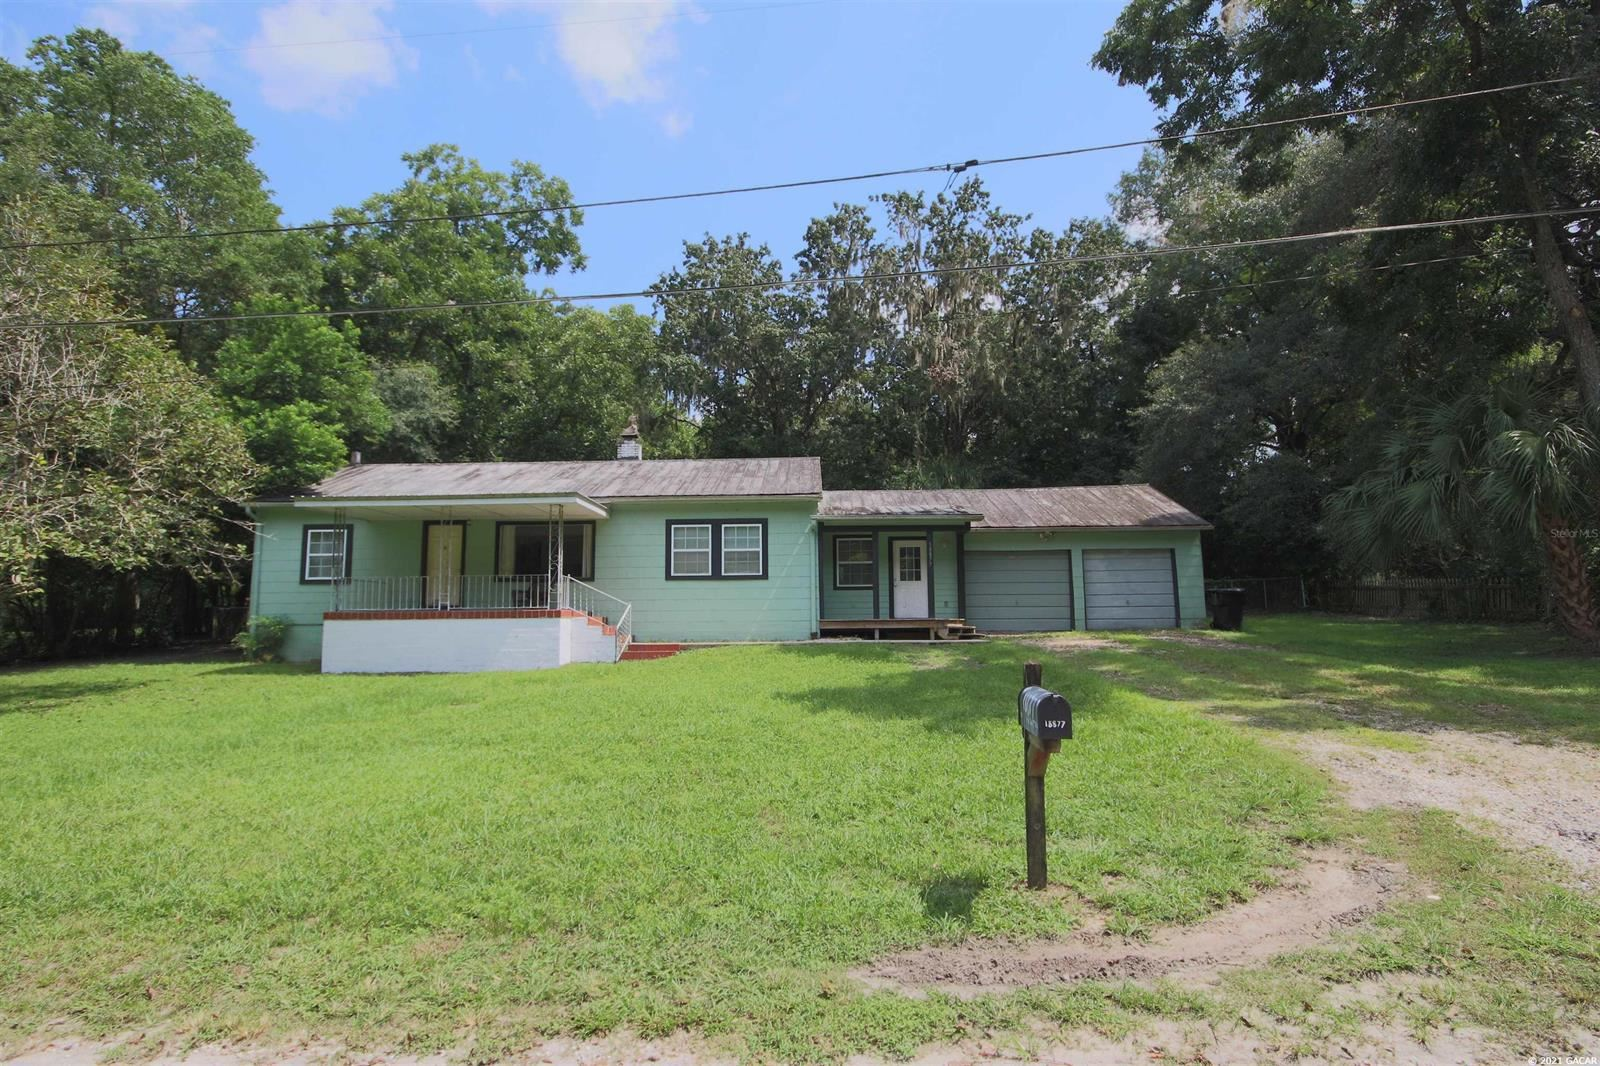 18877 NW 243 TERRACE, High Springs, FL 32643 - #: GC447857